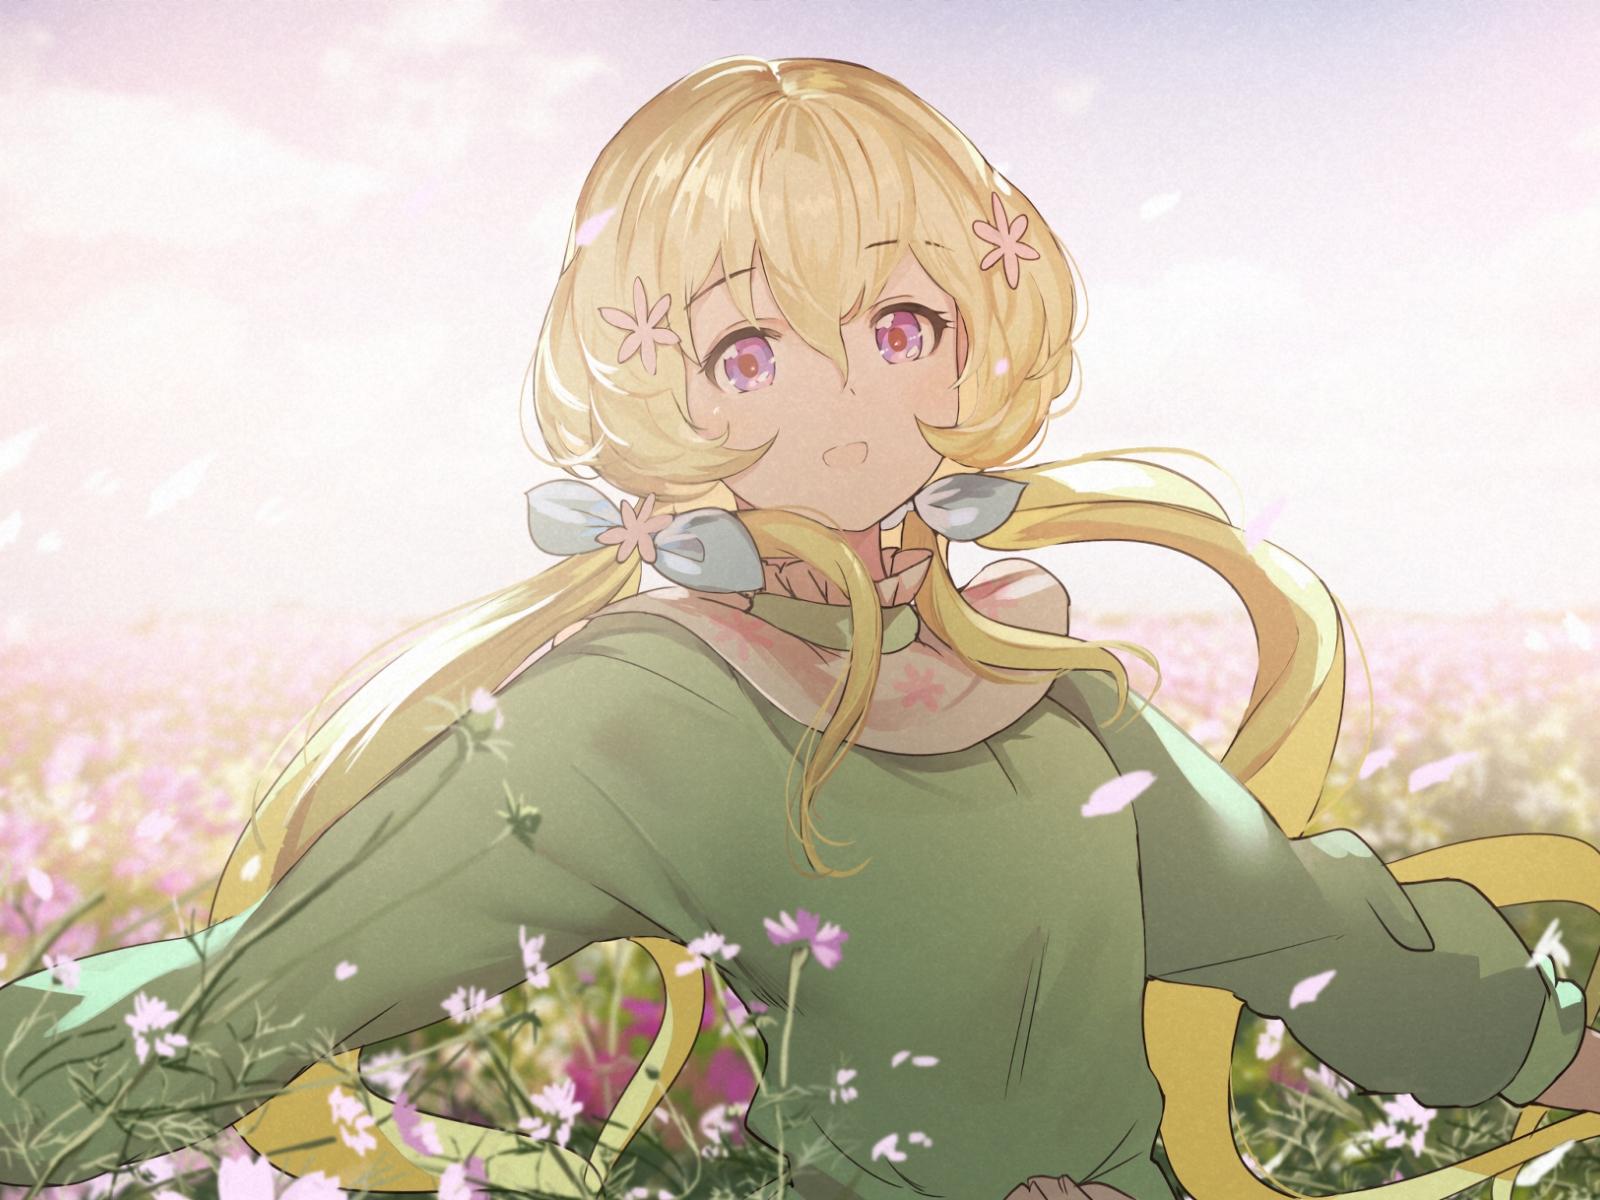 Download 1600x1200 wallpaper blonde anime girl aria - Anime 1600x1200 ...